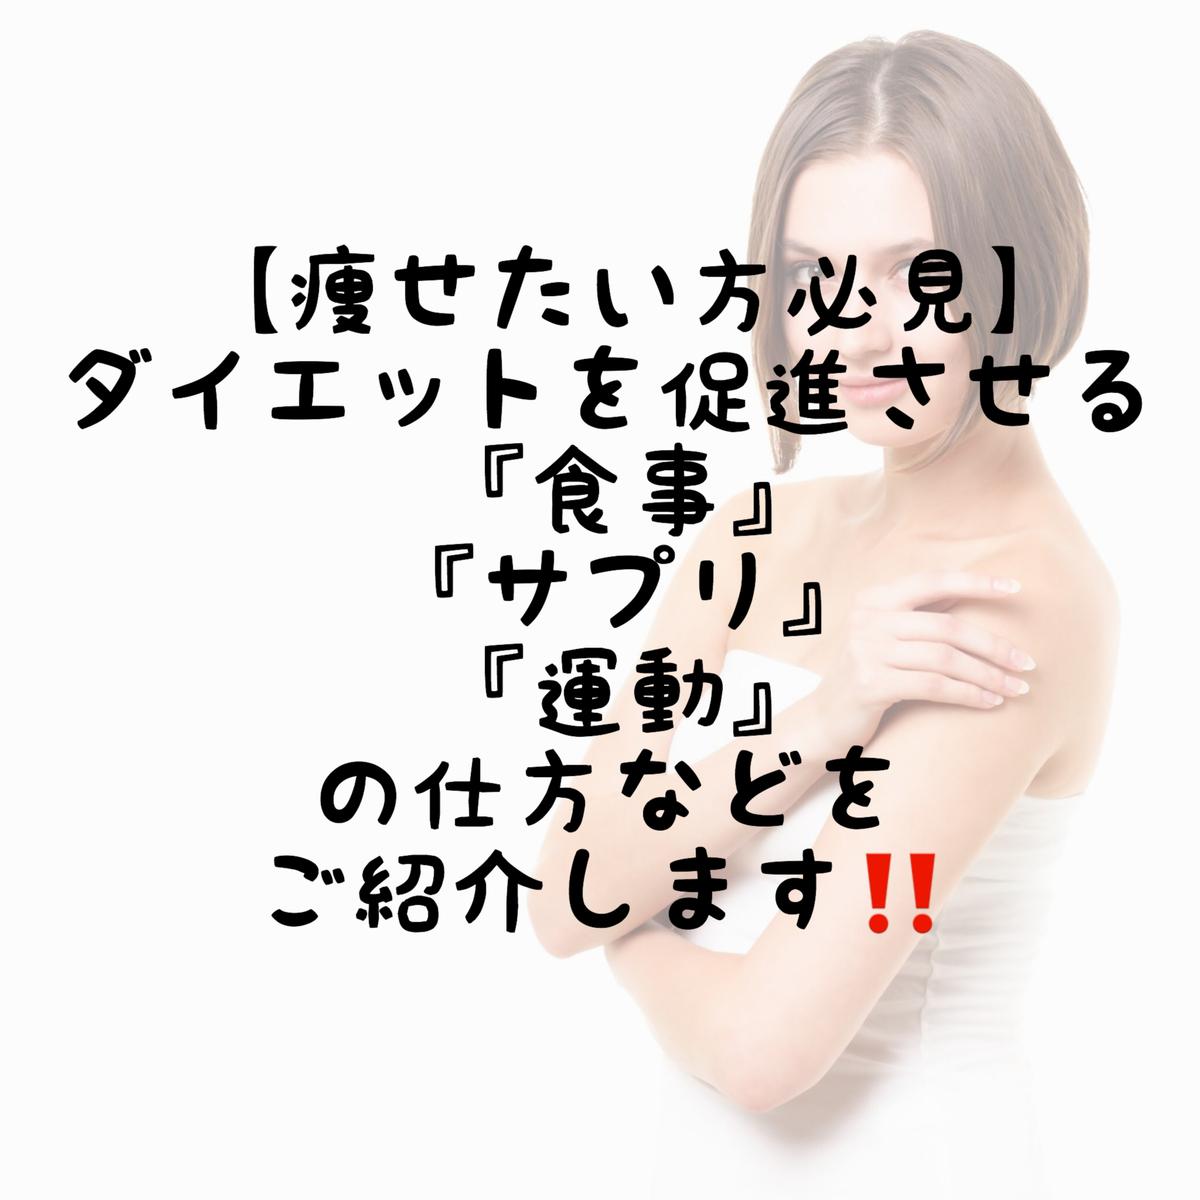 f:id:nokonoko_o:20200629194333j:plain